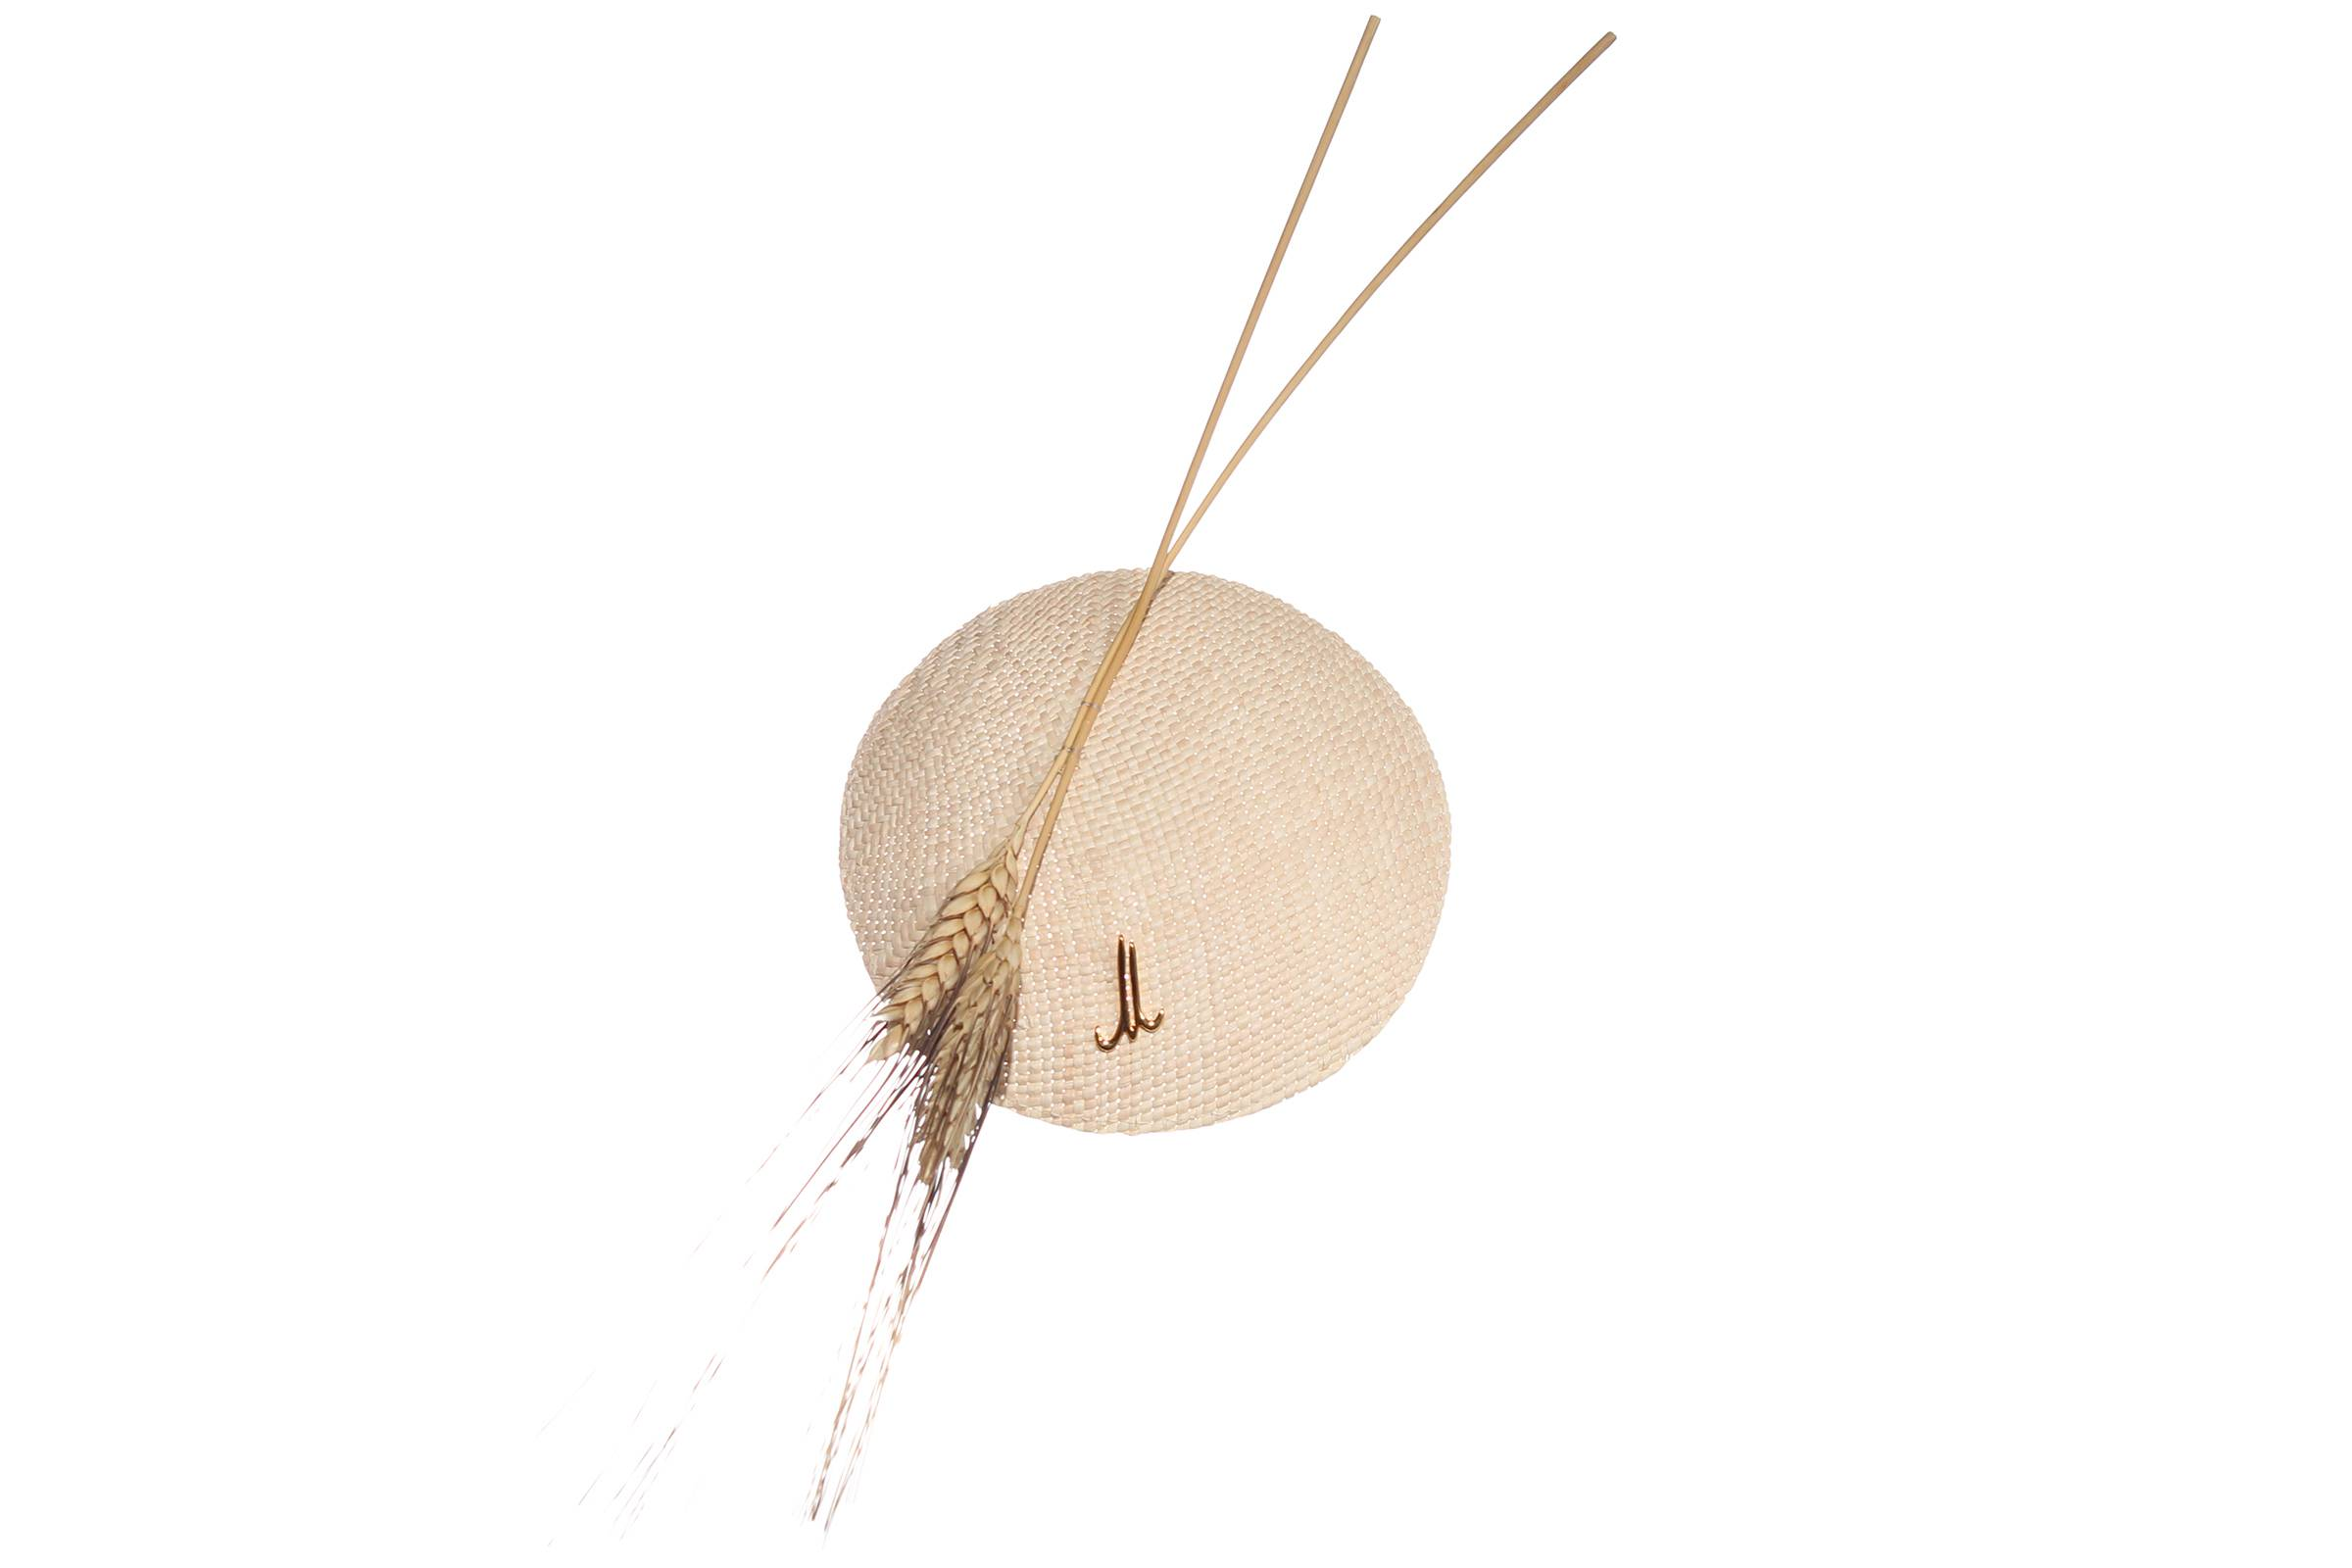 kippa LONE panama straw